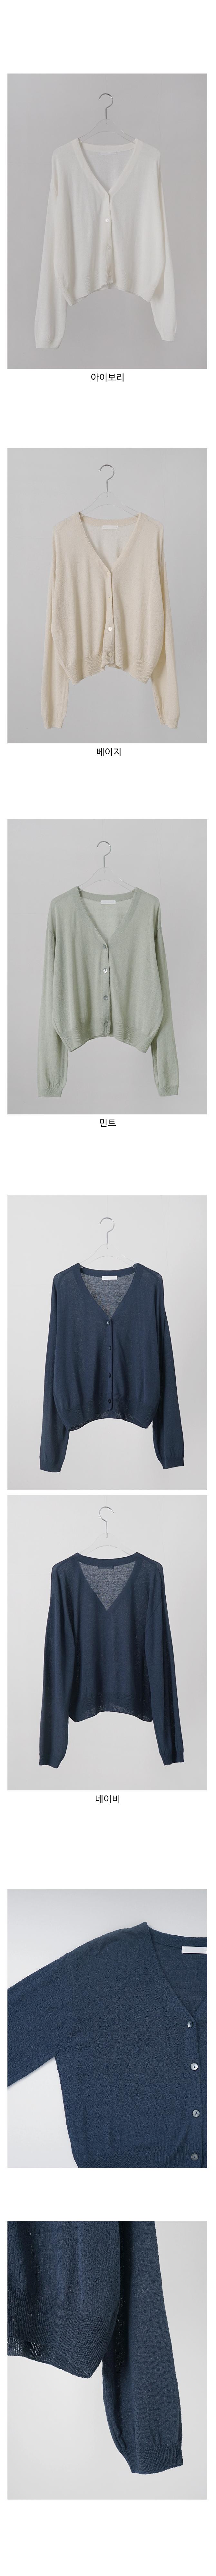 linen light cardigan (4colors)